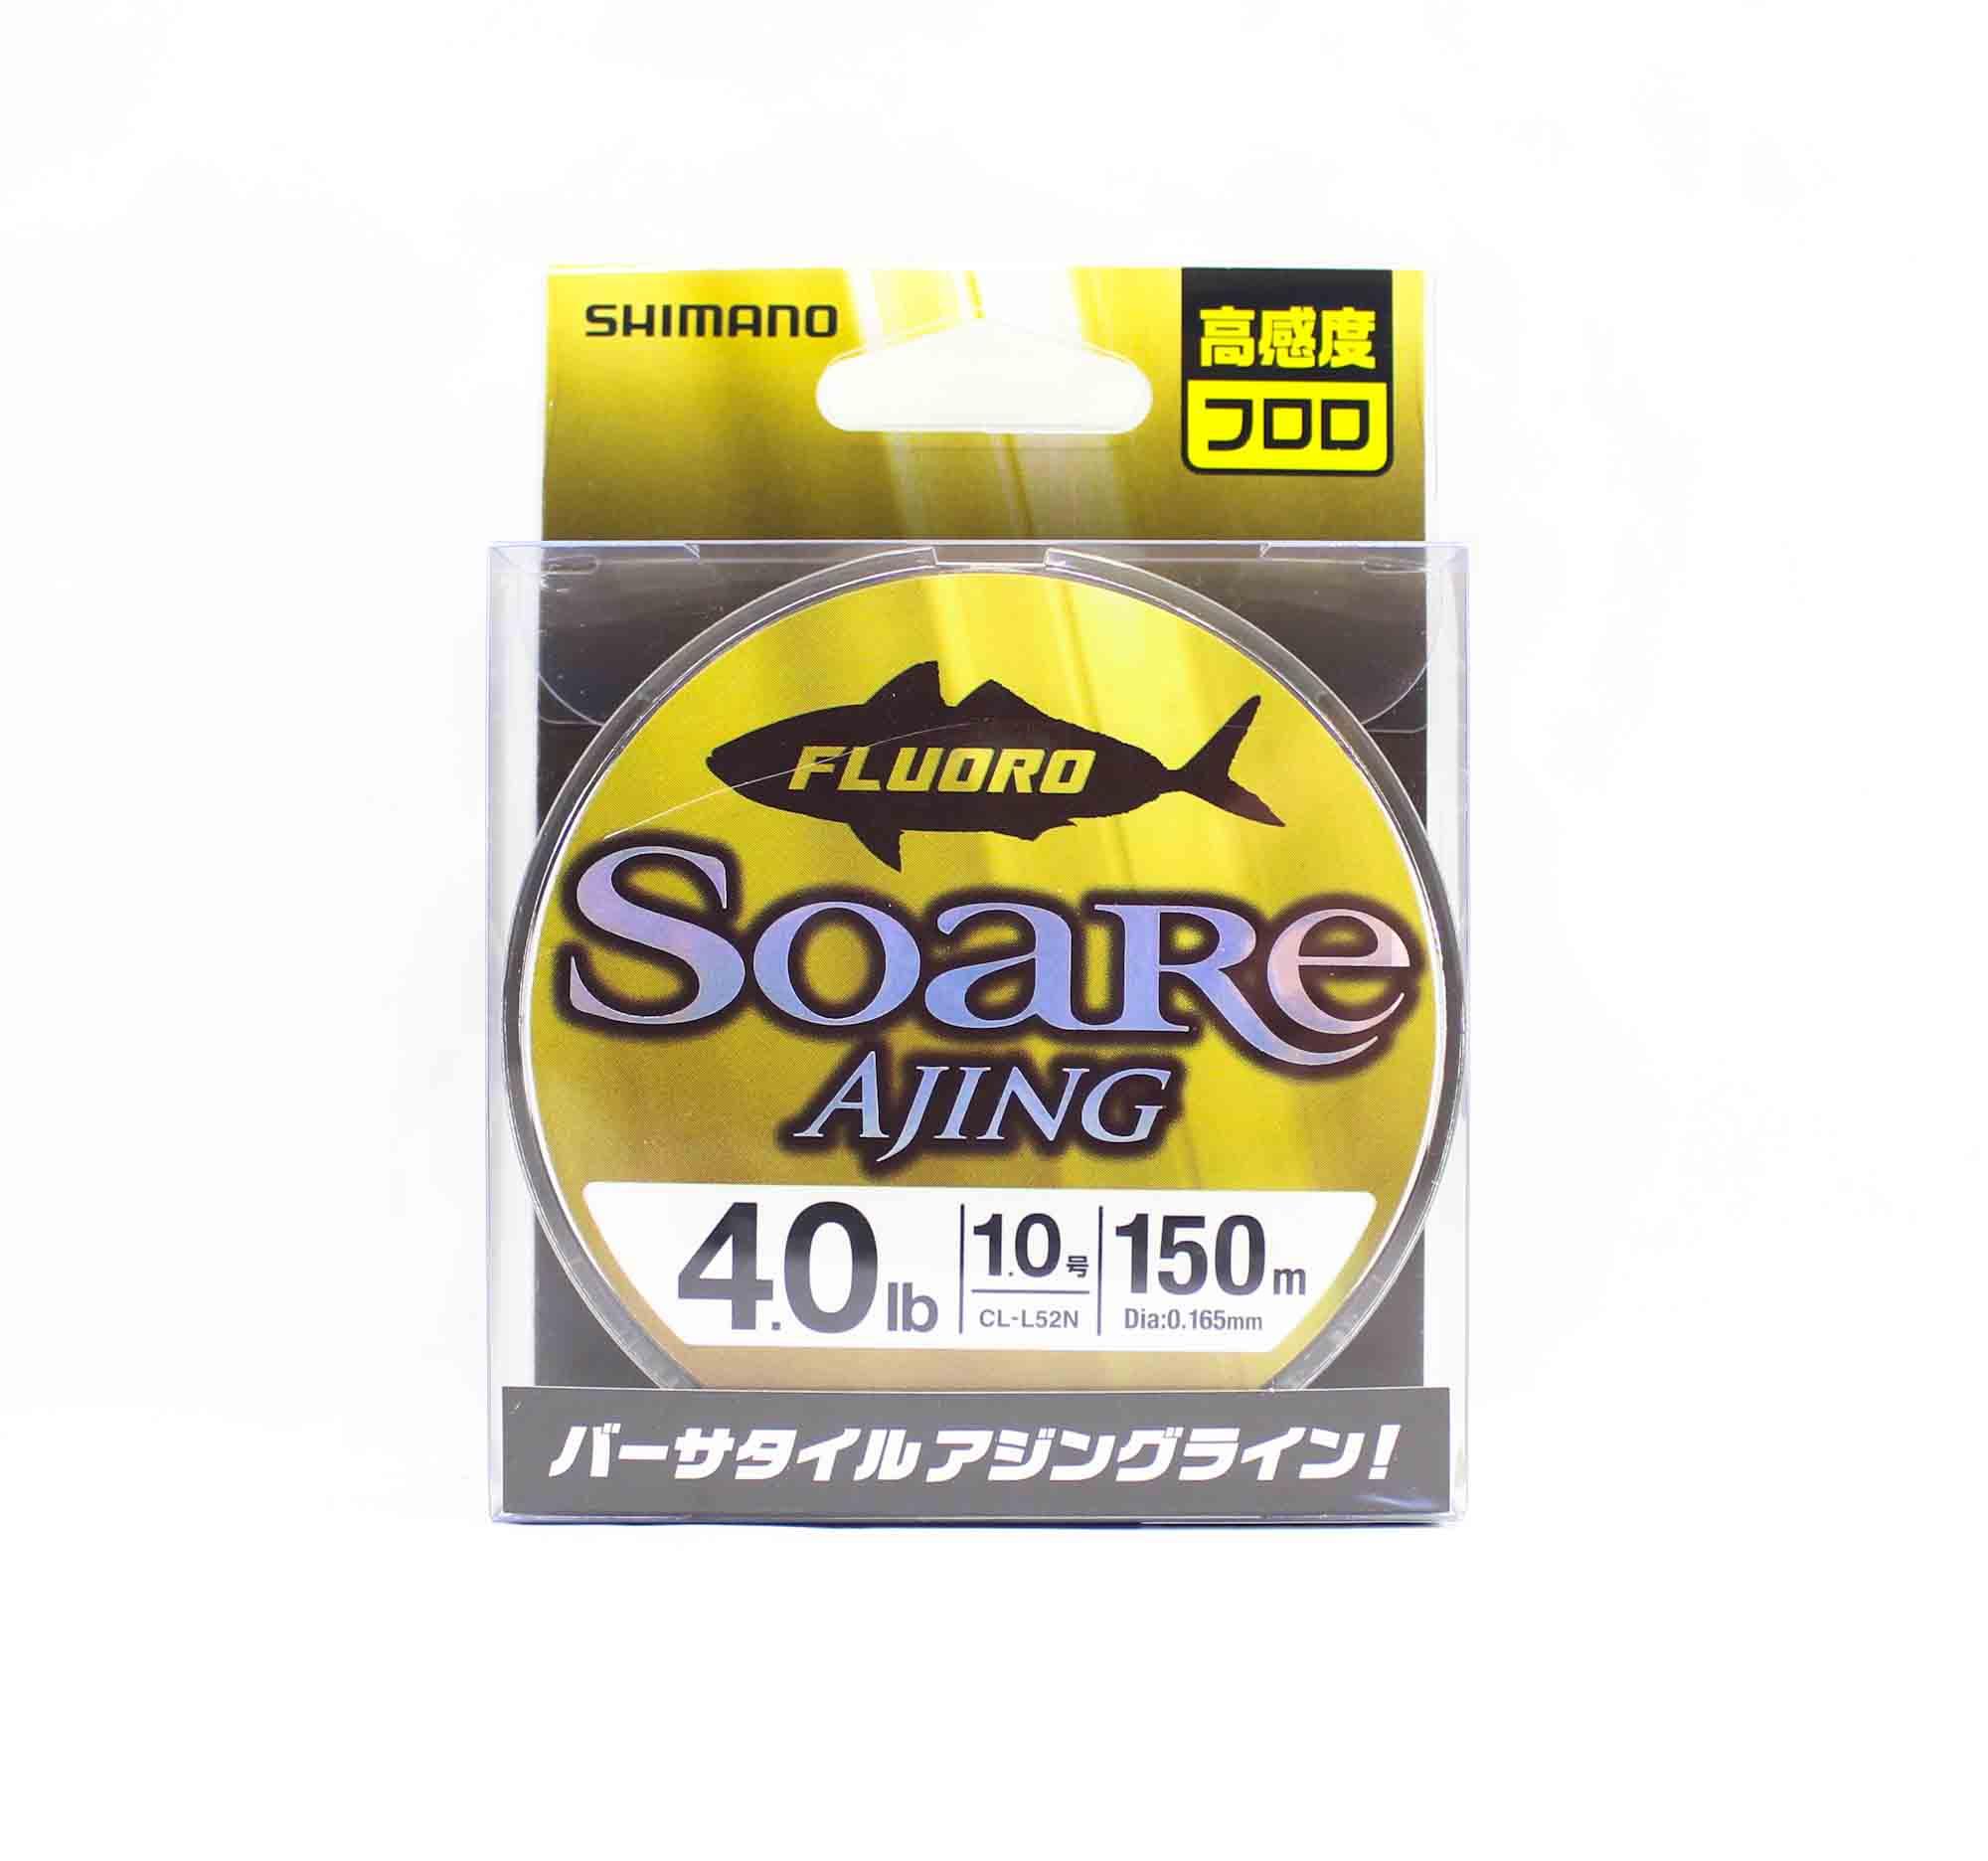 Shimano CL-52N Soare Ajing Fluorocarbon Line 150m Size 1.0 4.0lb 442659